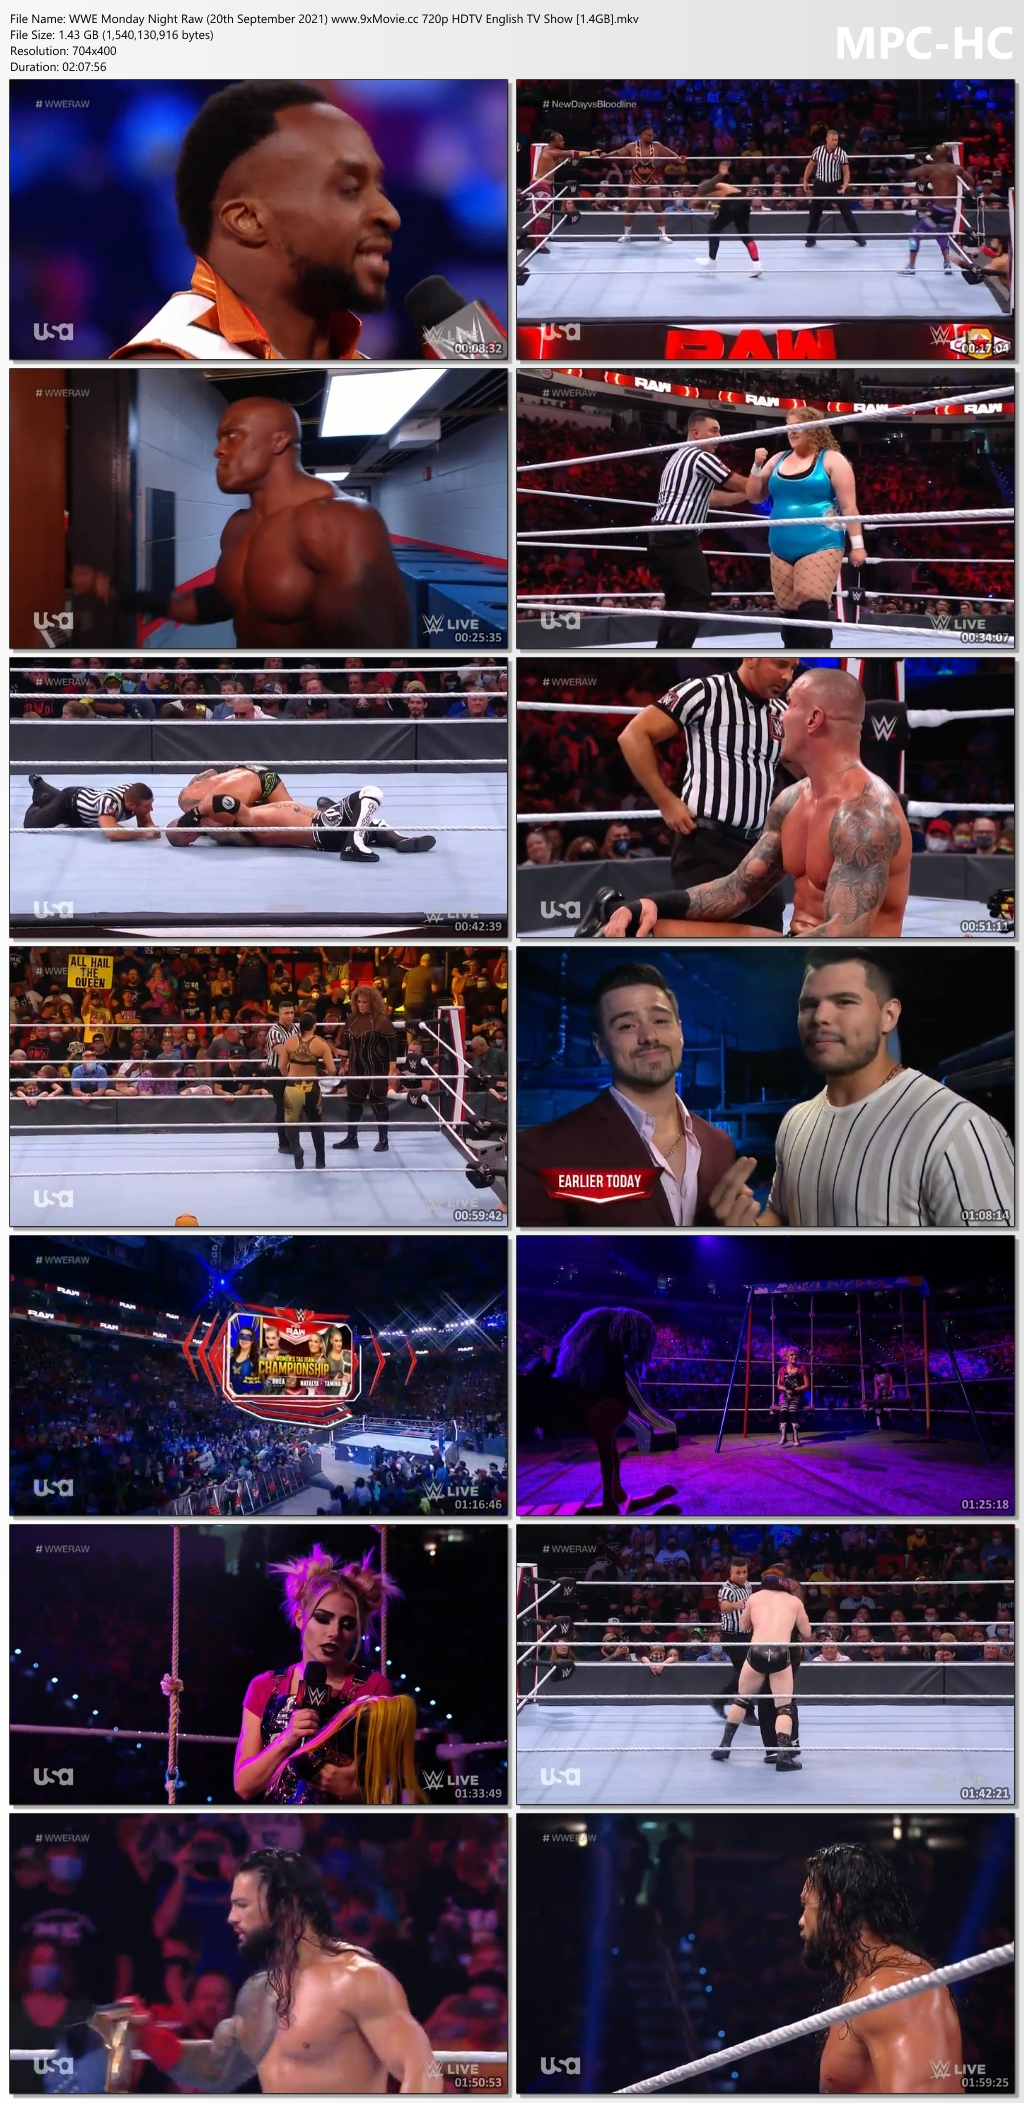 WWE-Monday-Night-Raw-20th-September-2021-www-9x-Movie-cc-720p-HDTV-English-TV-Show-1-4-GB-mkv